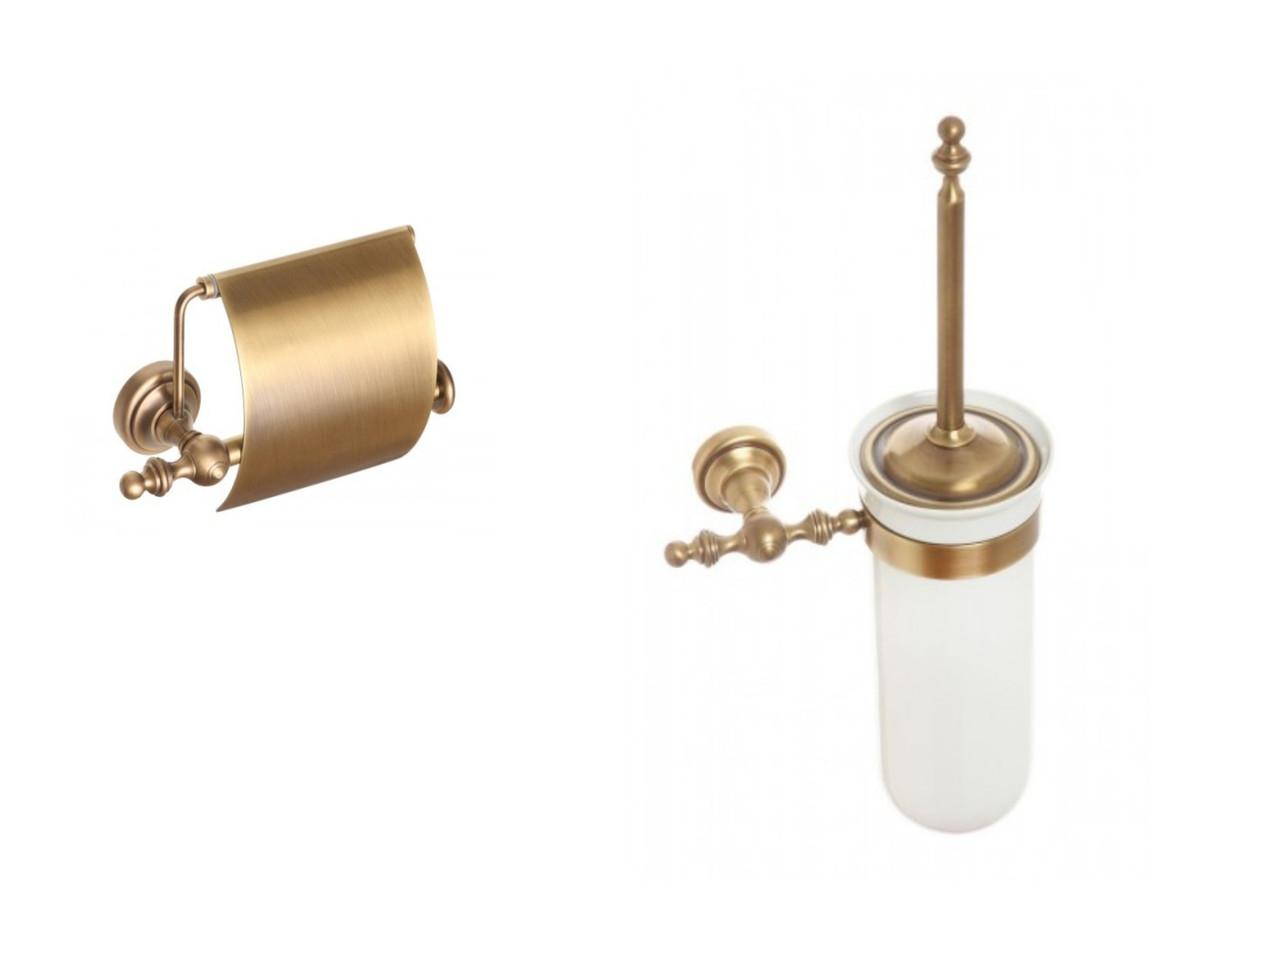 Набор аксессуаров для ванной комнаты Richmond, R302k бронза